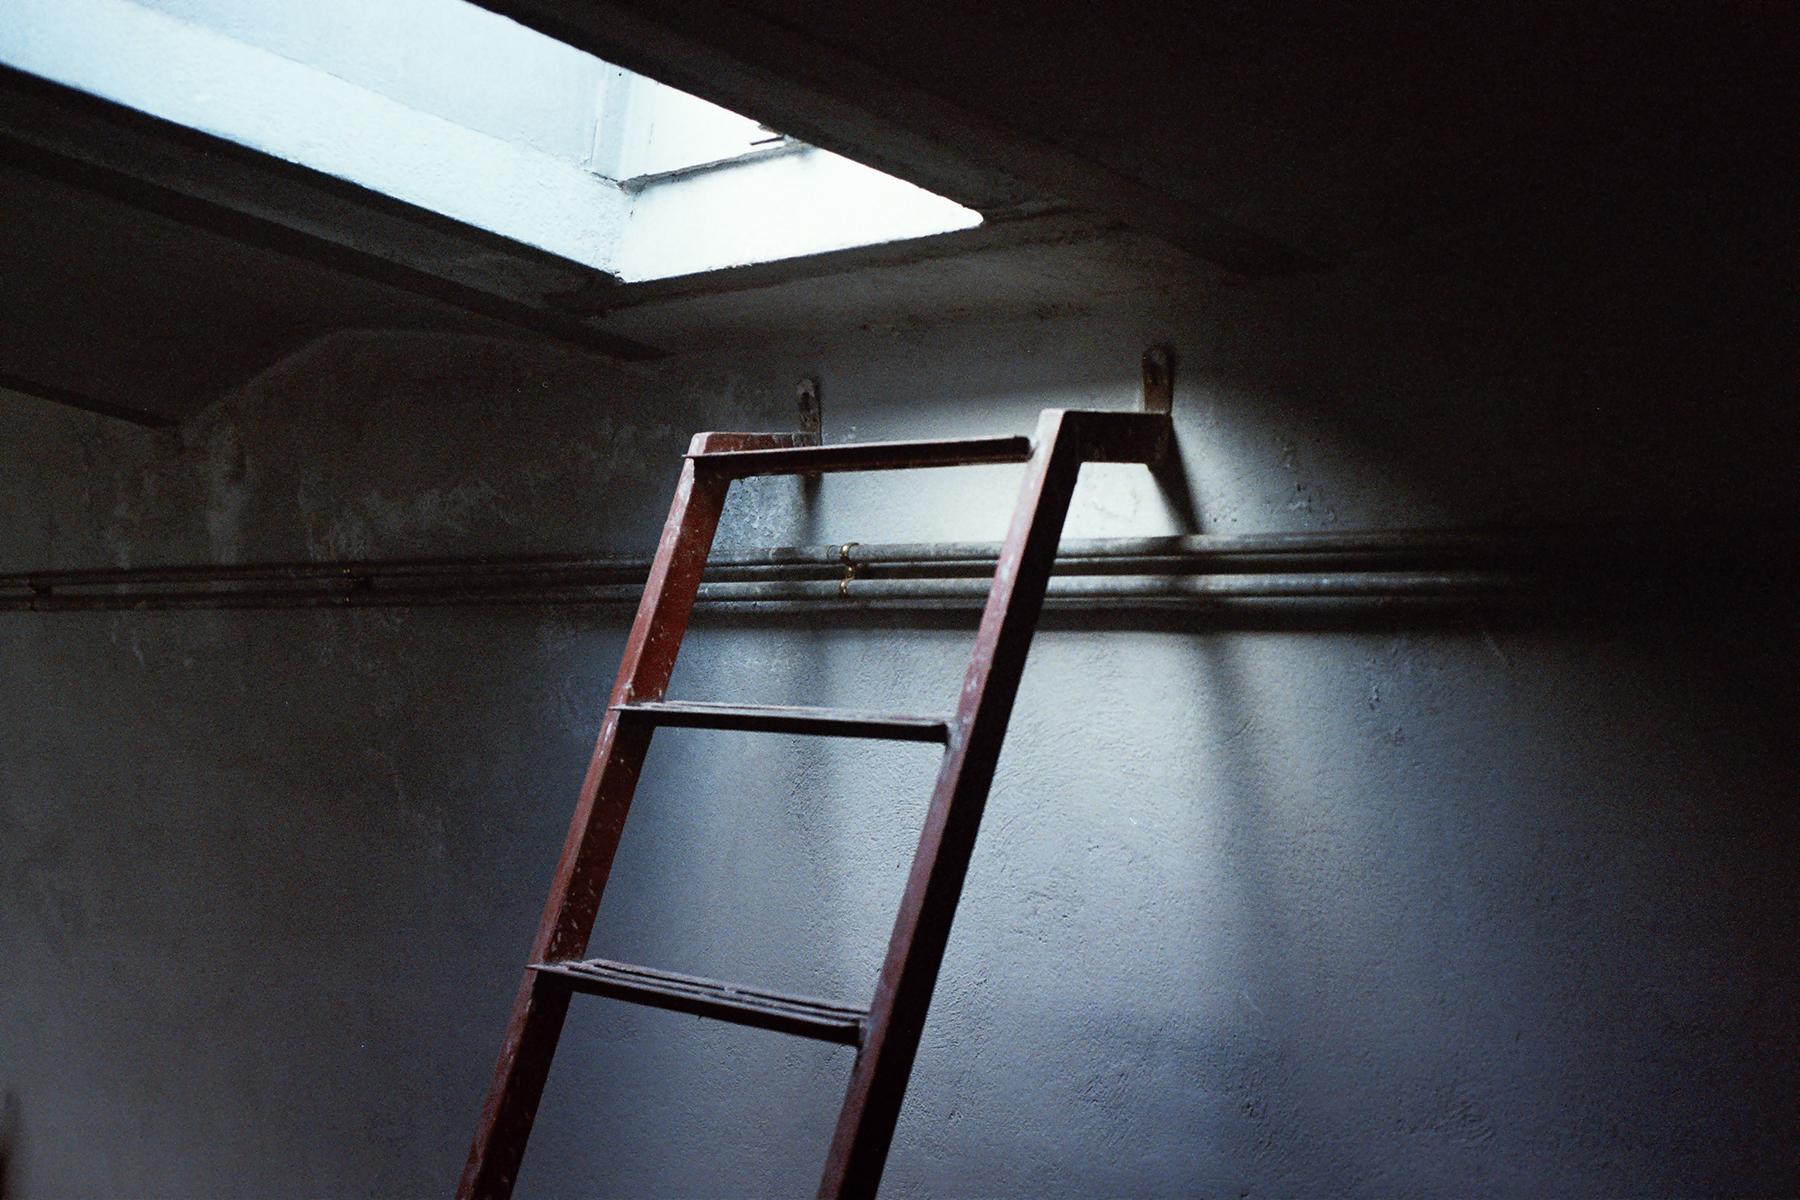 Artemi Schubert | Dead End | NikonFM2 | 50mm